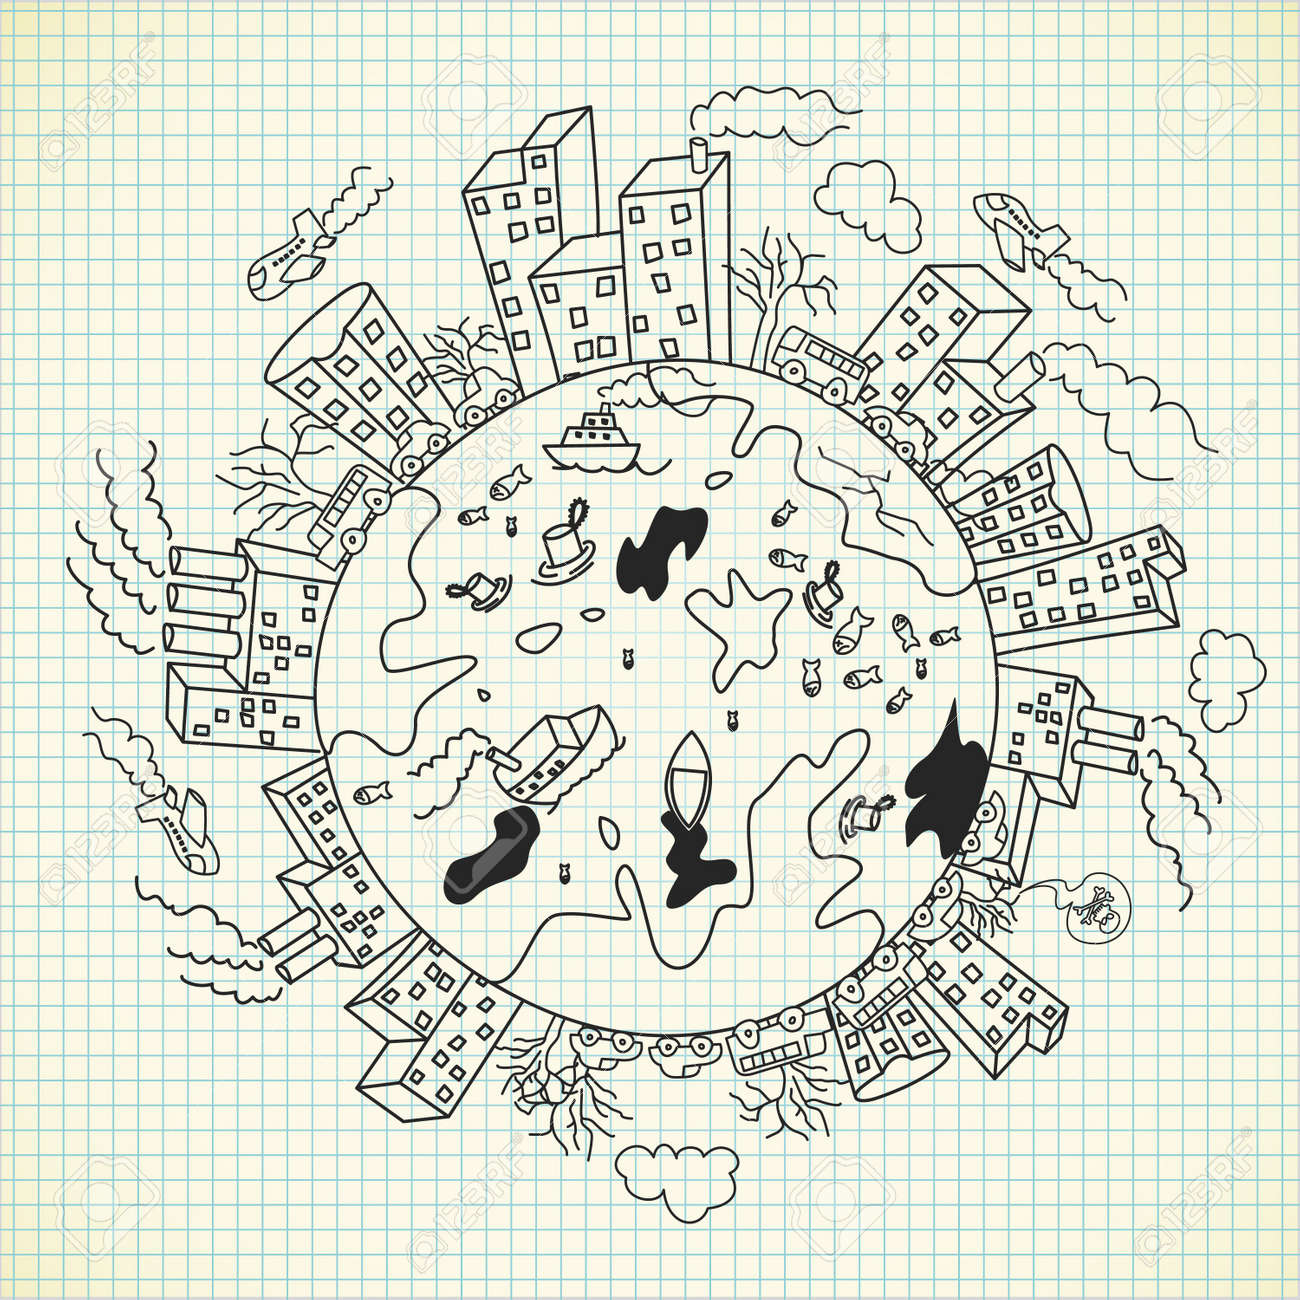 pollution doodle - 9706791